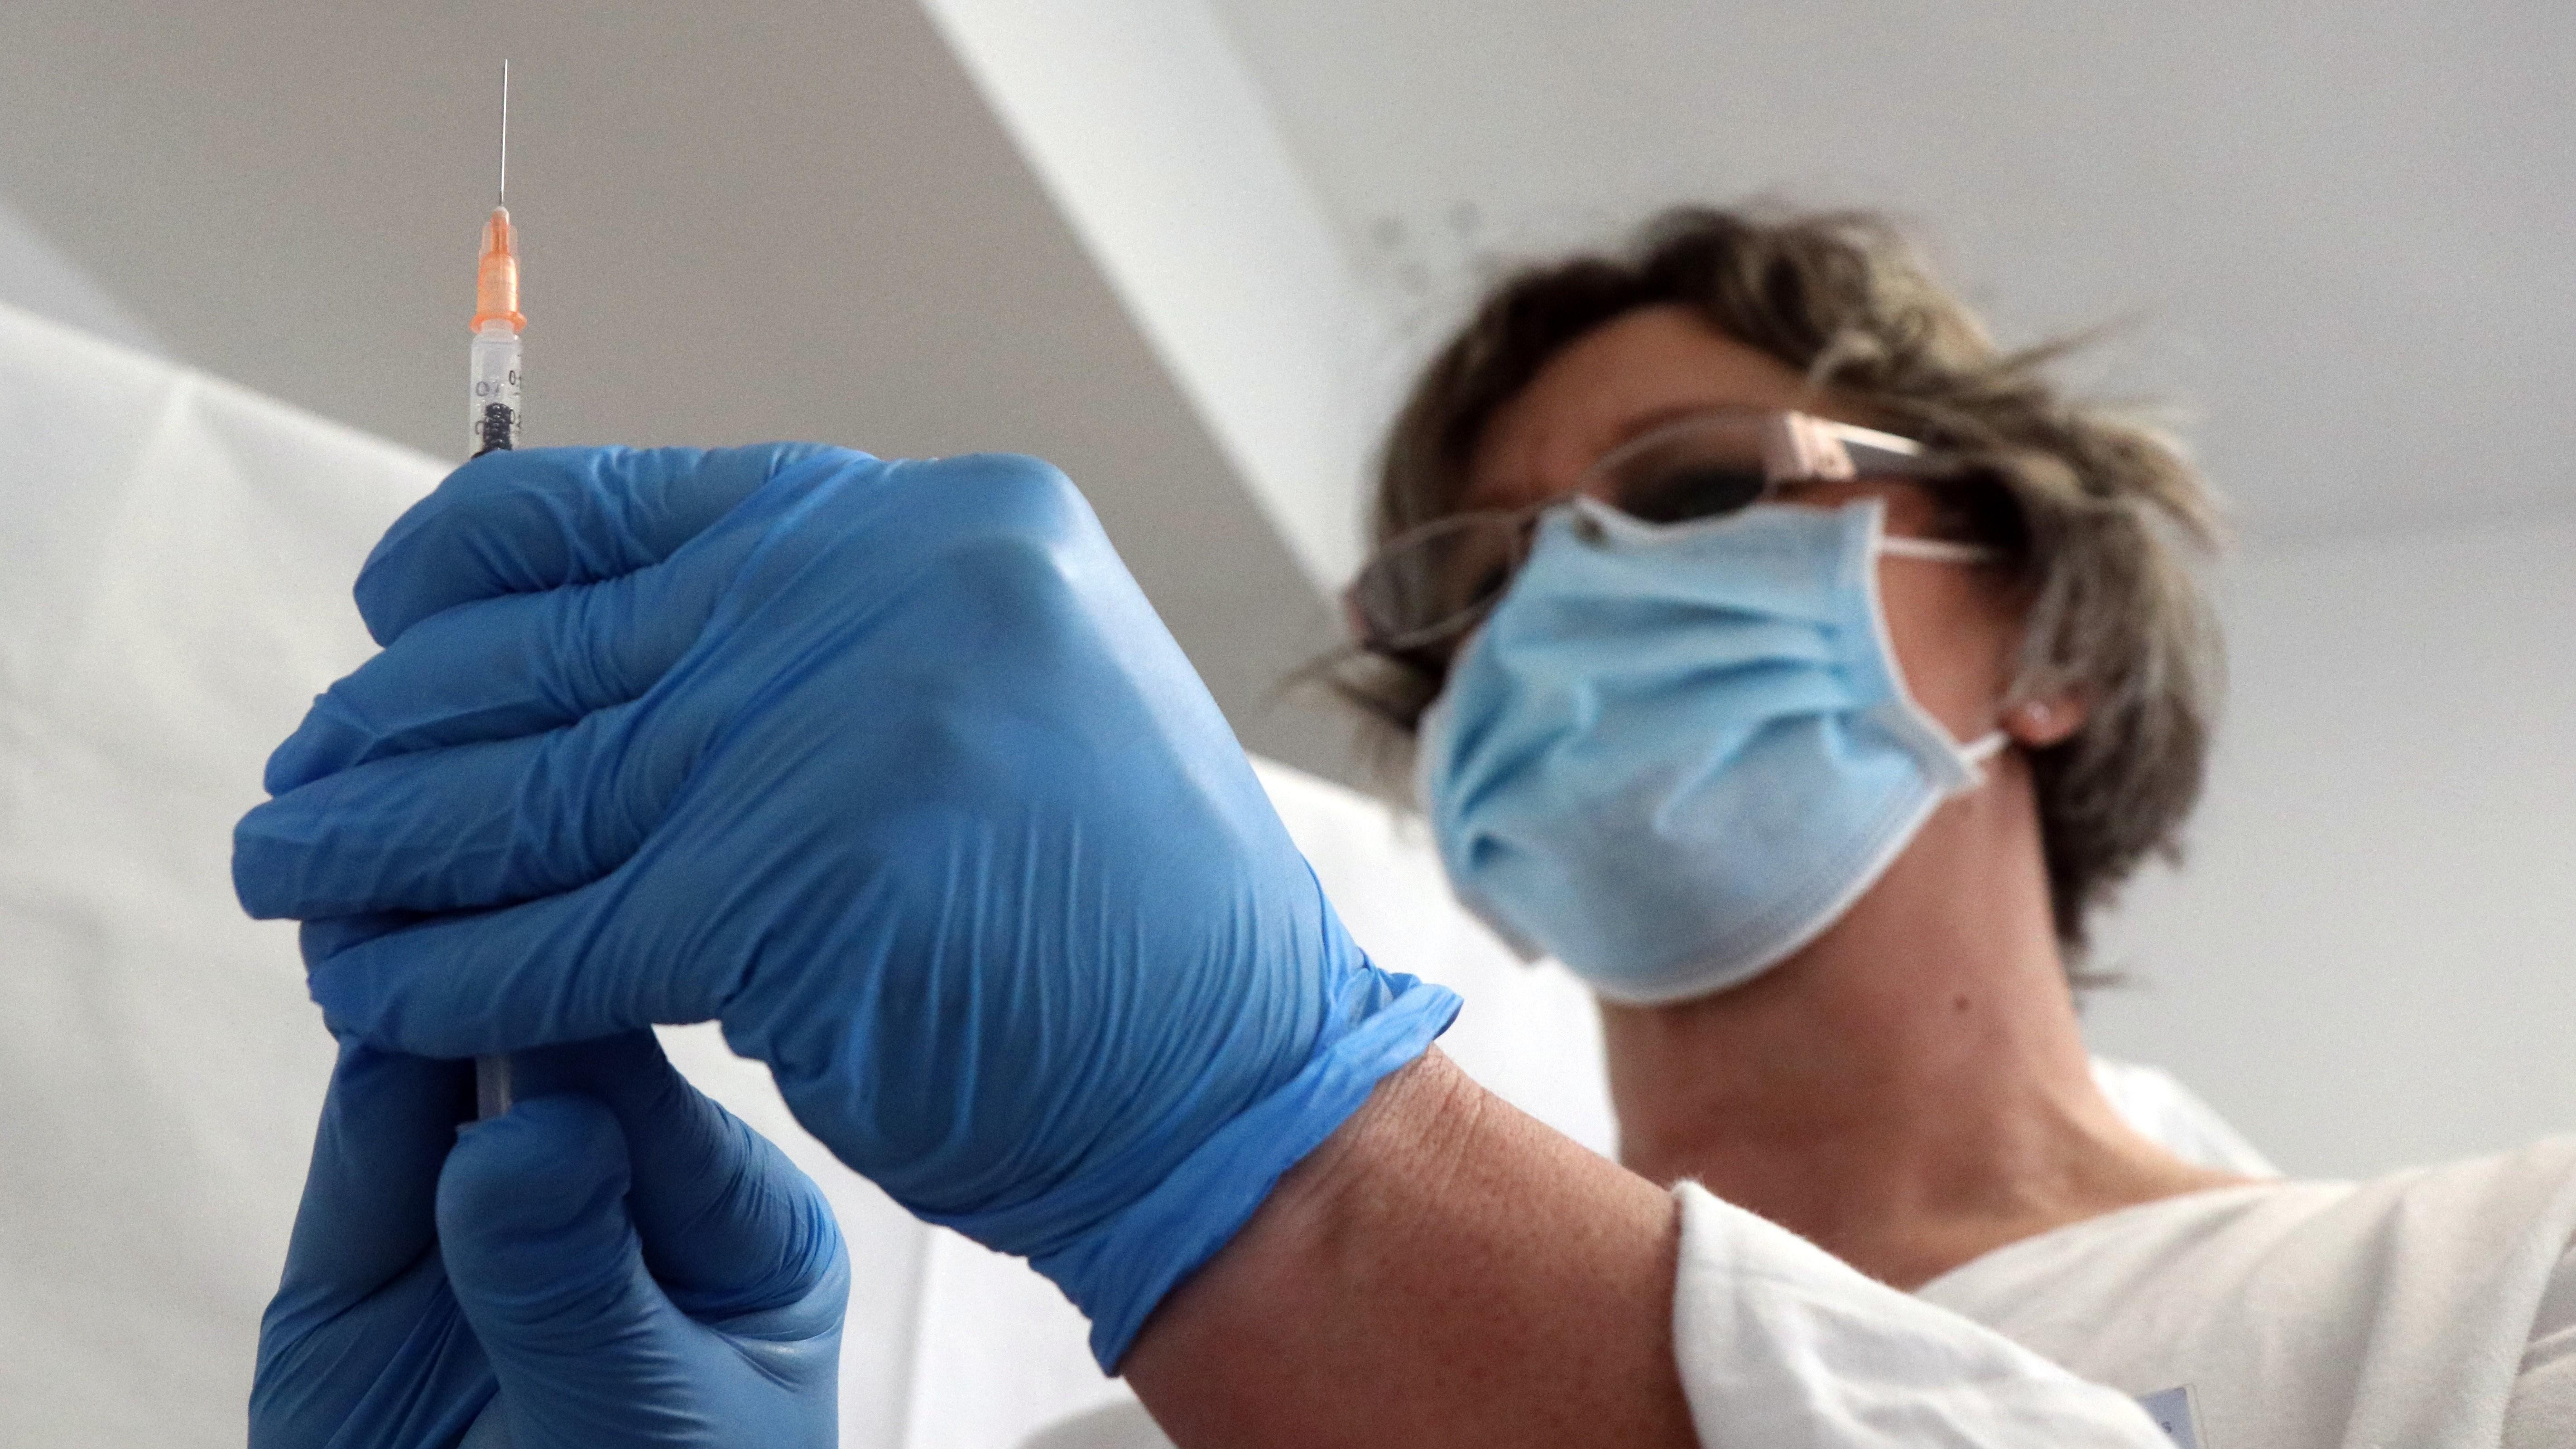 koronavírus elleni vakcina